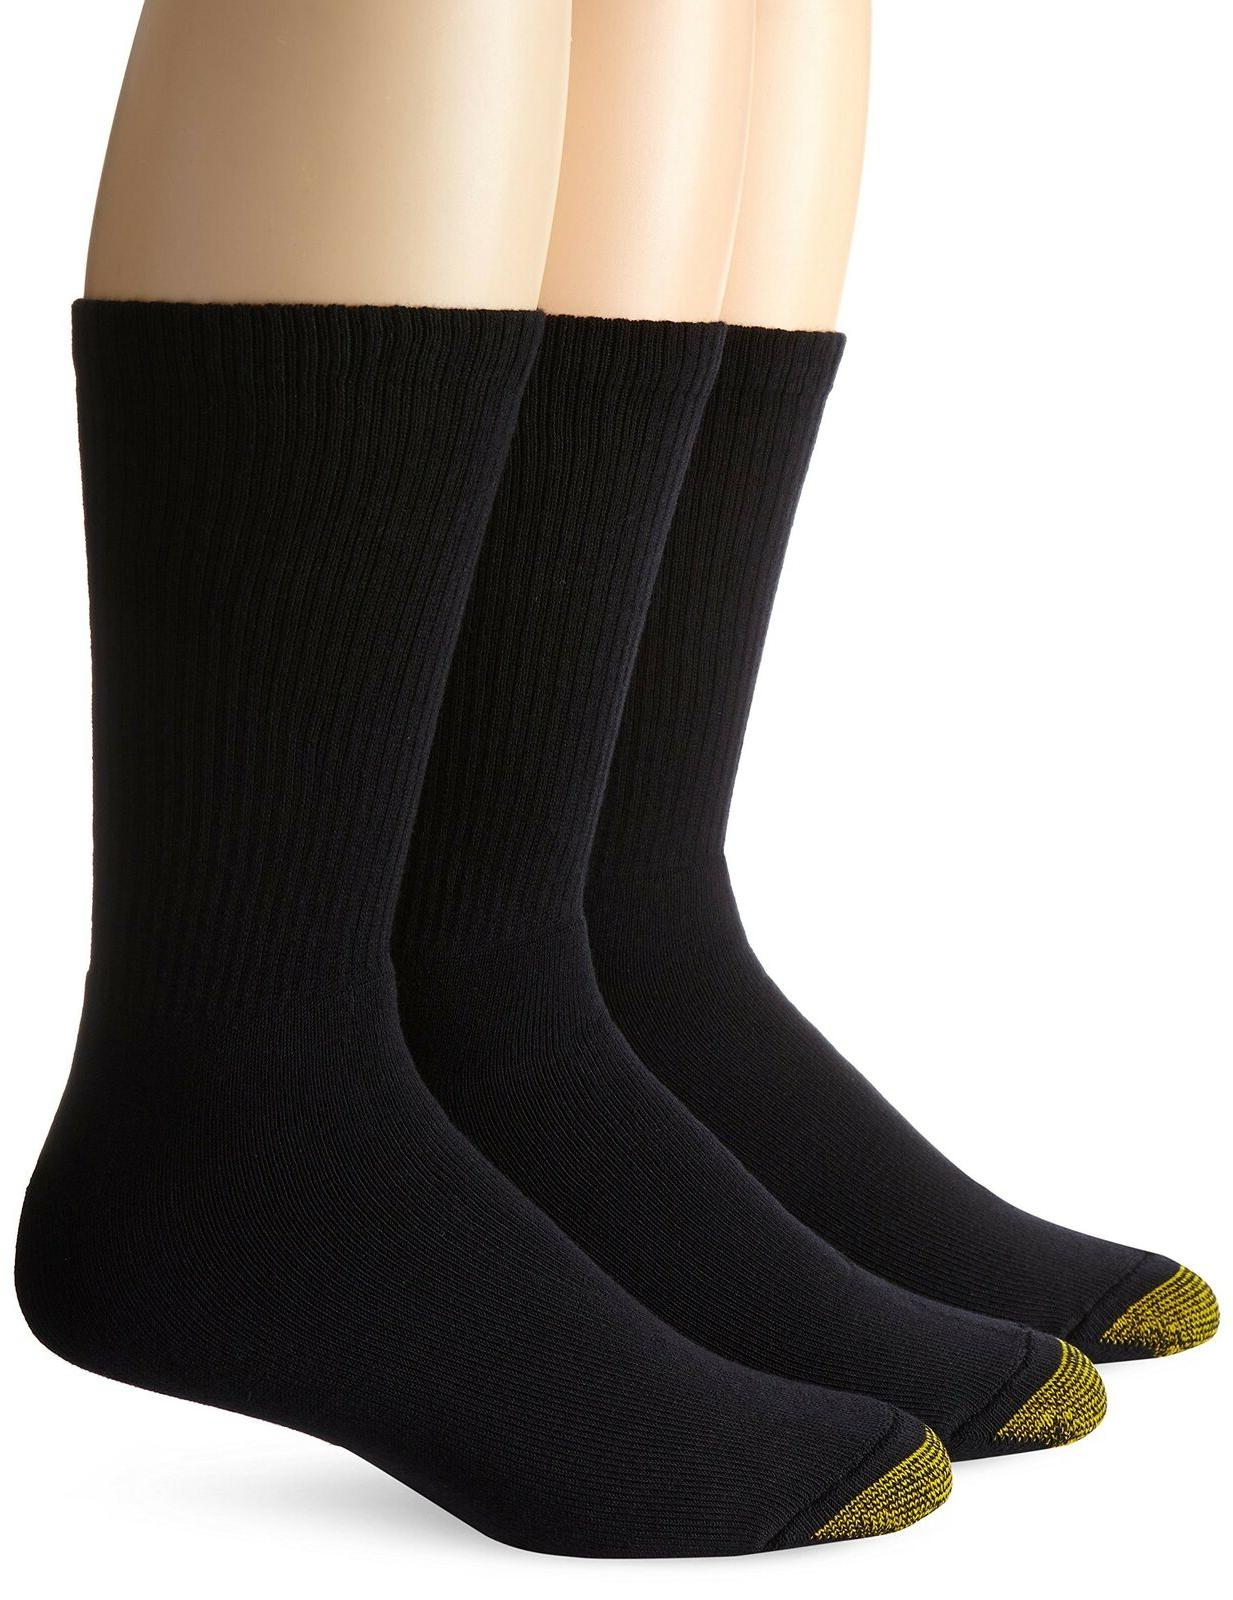 uptown crew socks